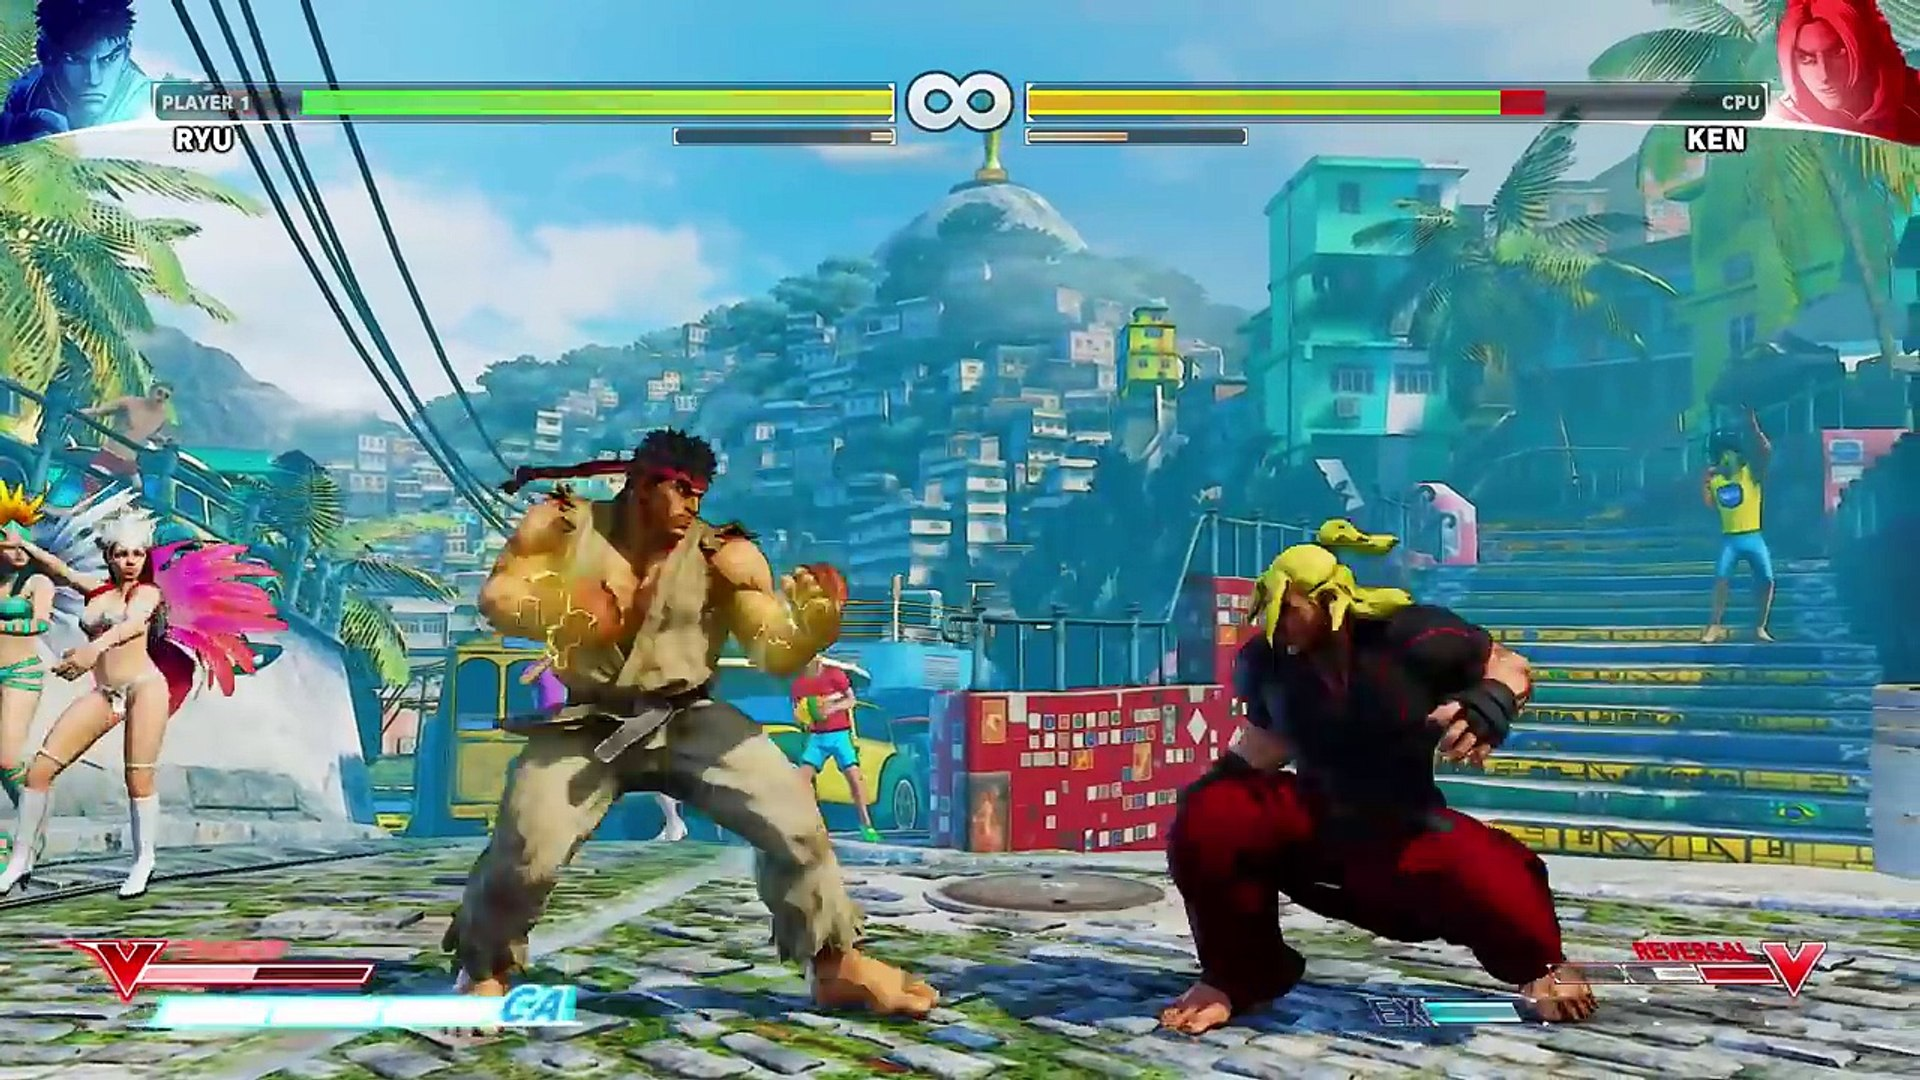 Street Fighter V Gameplay Walkthrough Part 1 Ryu Ken Story Mode Video Dailymotion